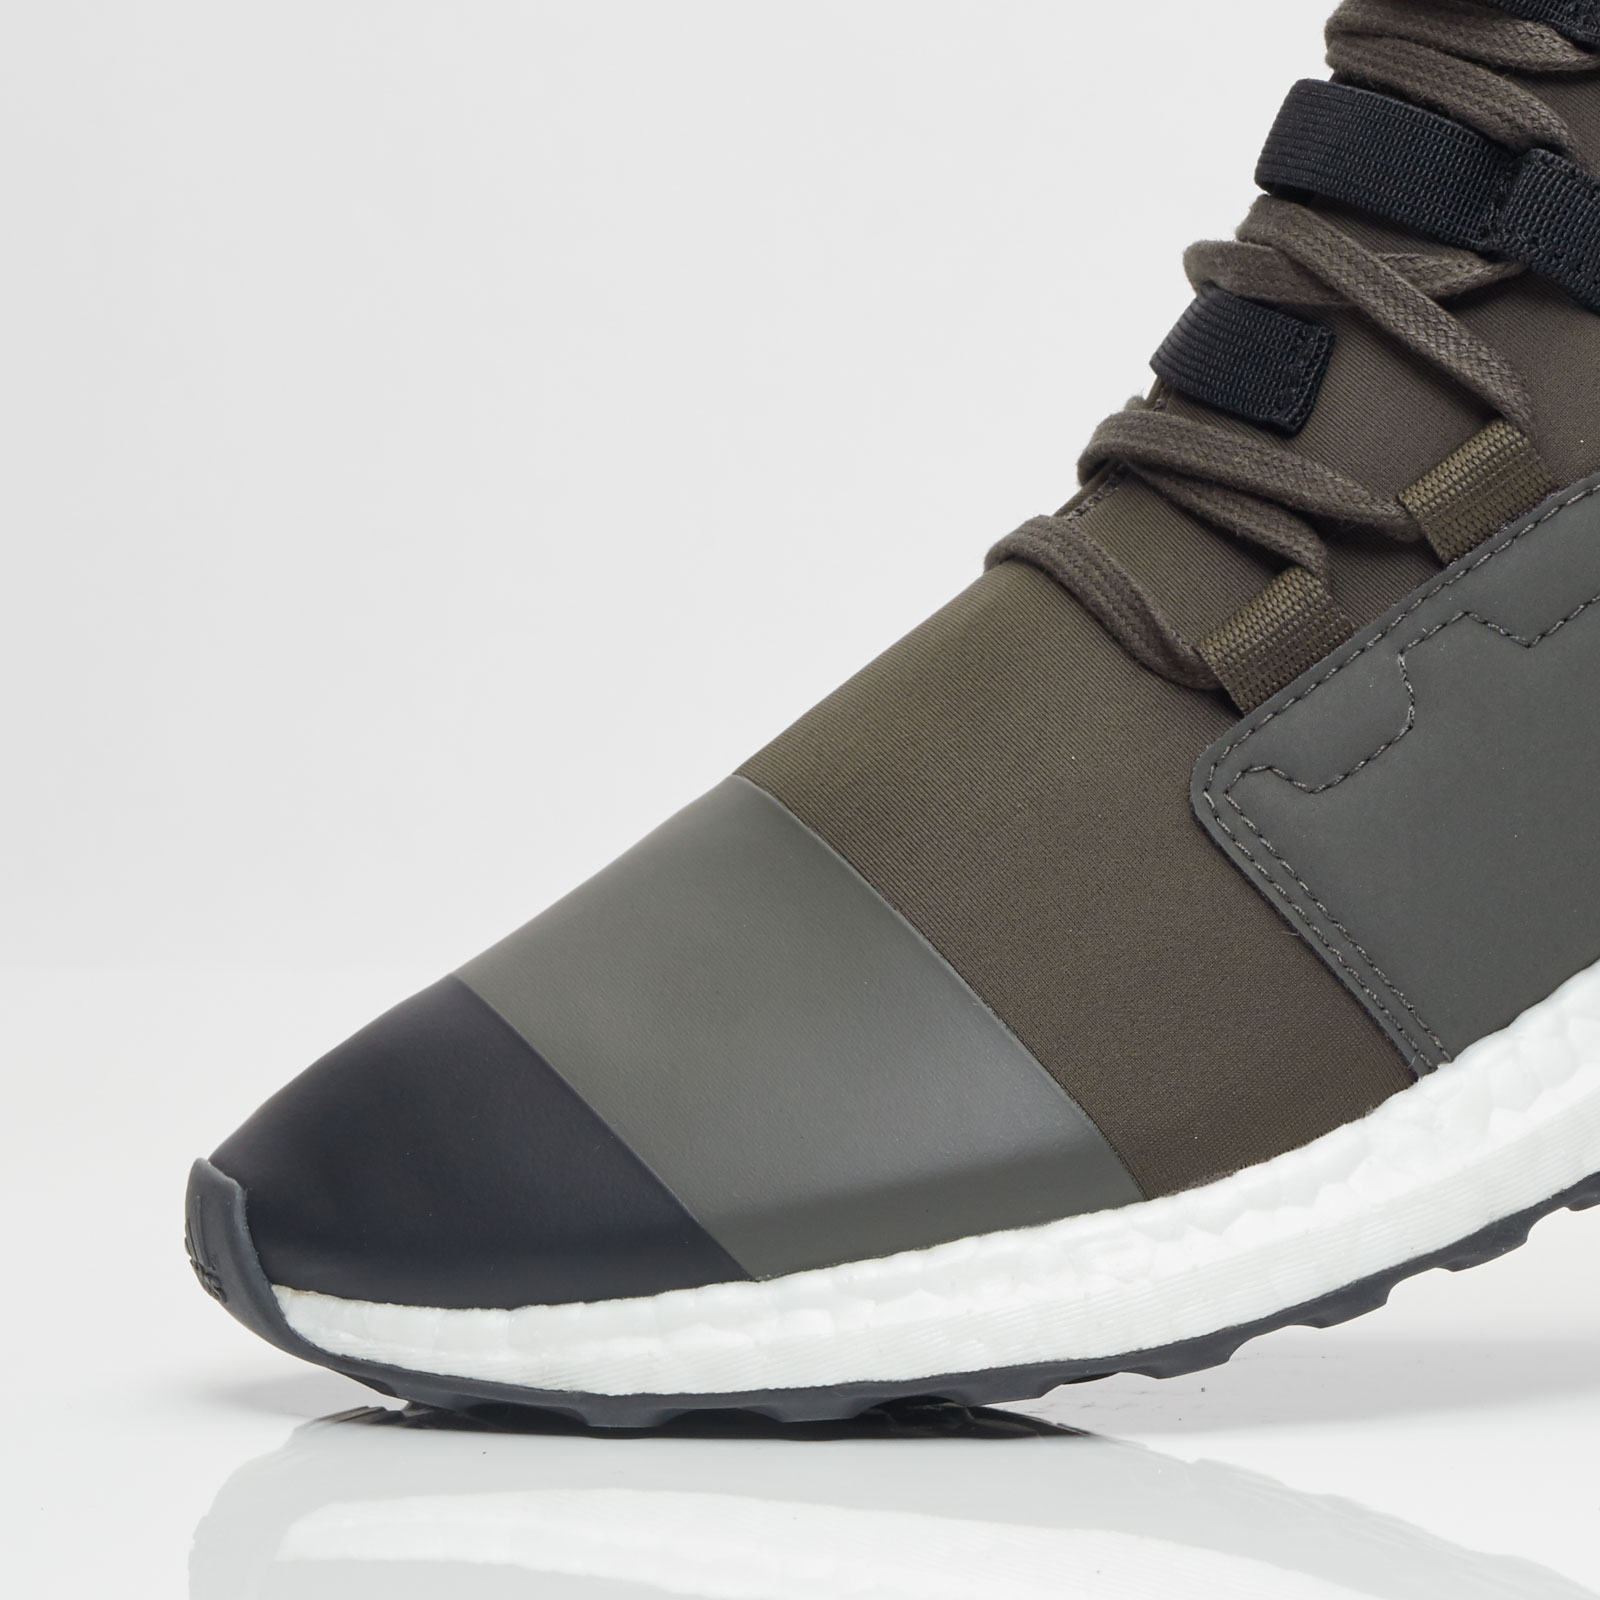 4ae32b43b788 adidas Kozoko Low - Cg3161 - Sneakersnstuff